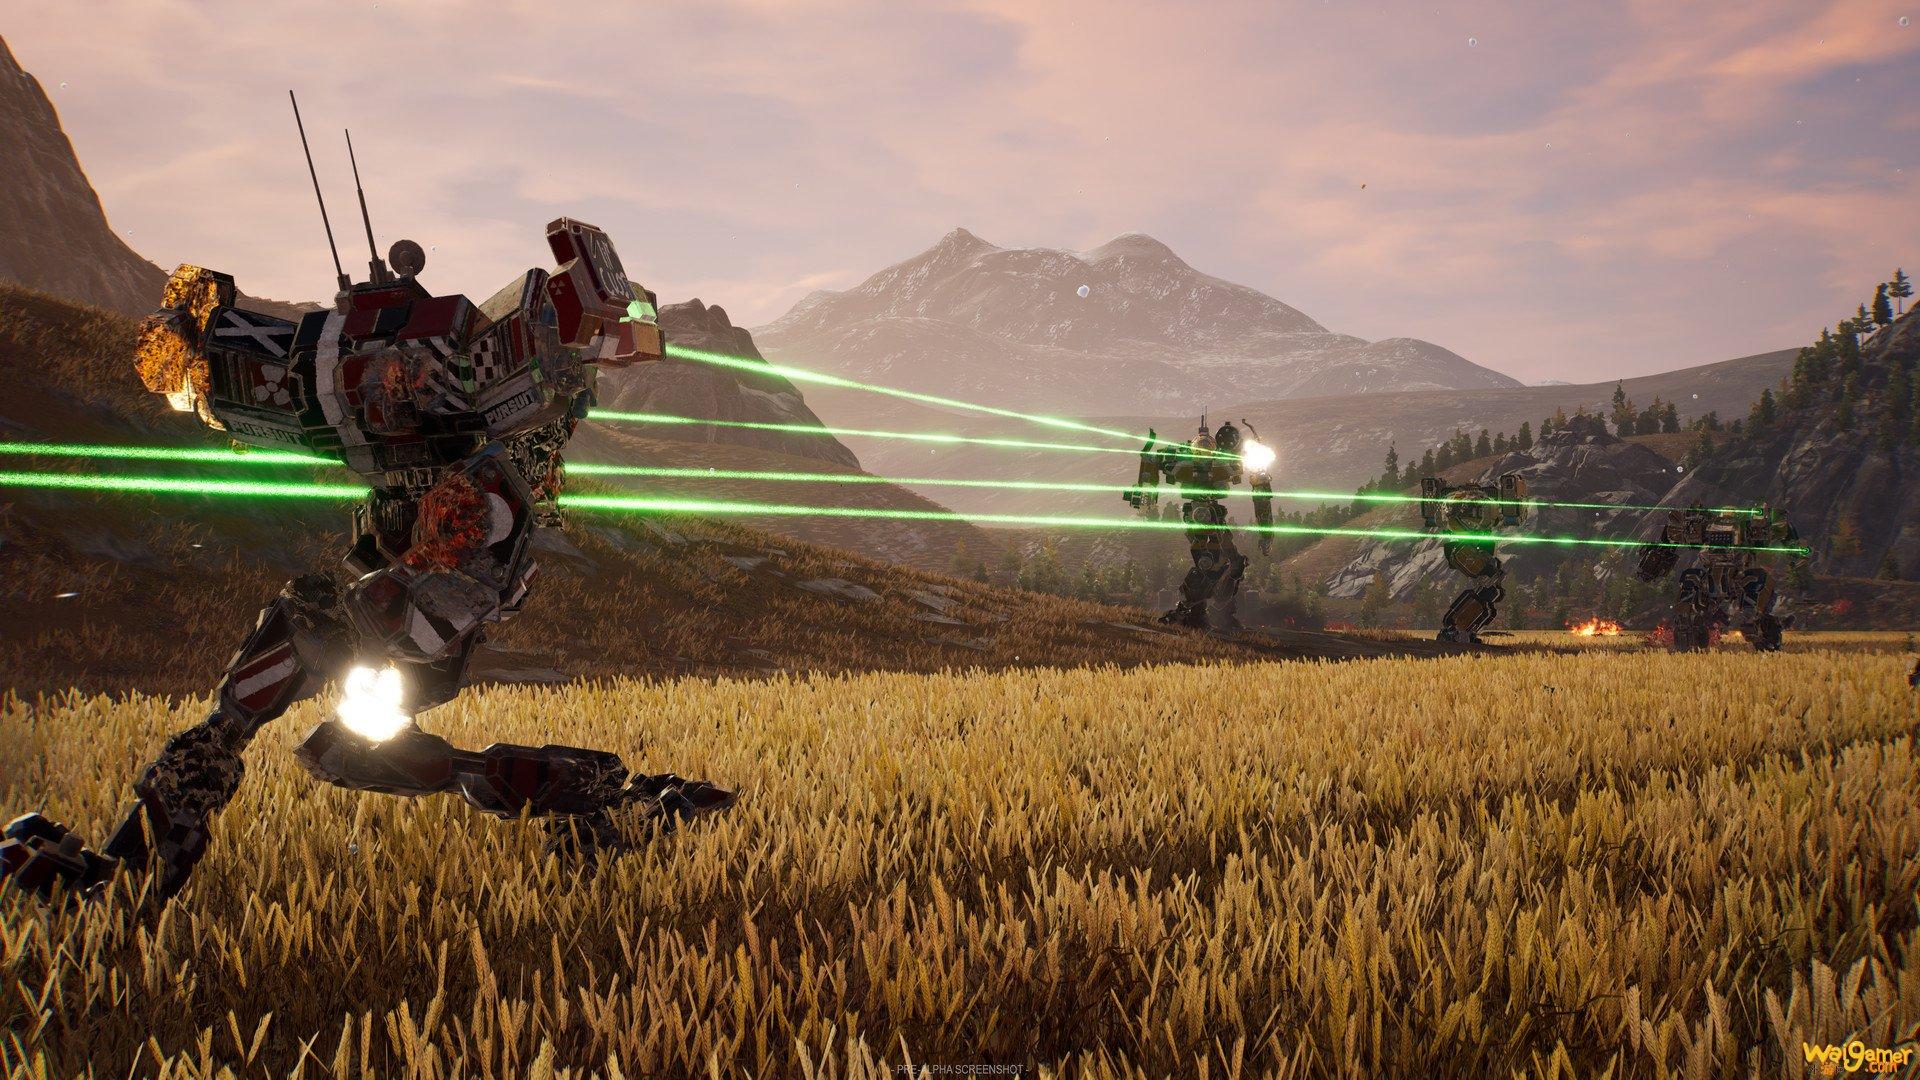 Epic独佔即将结束 《机甲争霸战5:佣兵》已在Steam上架